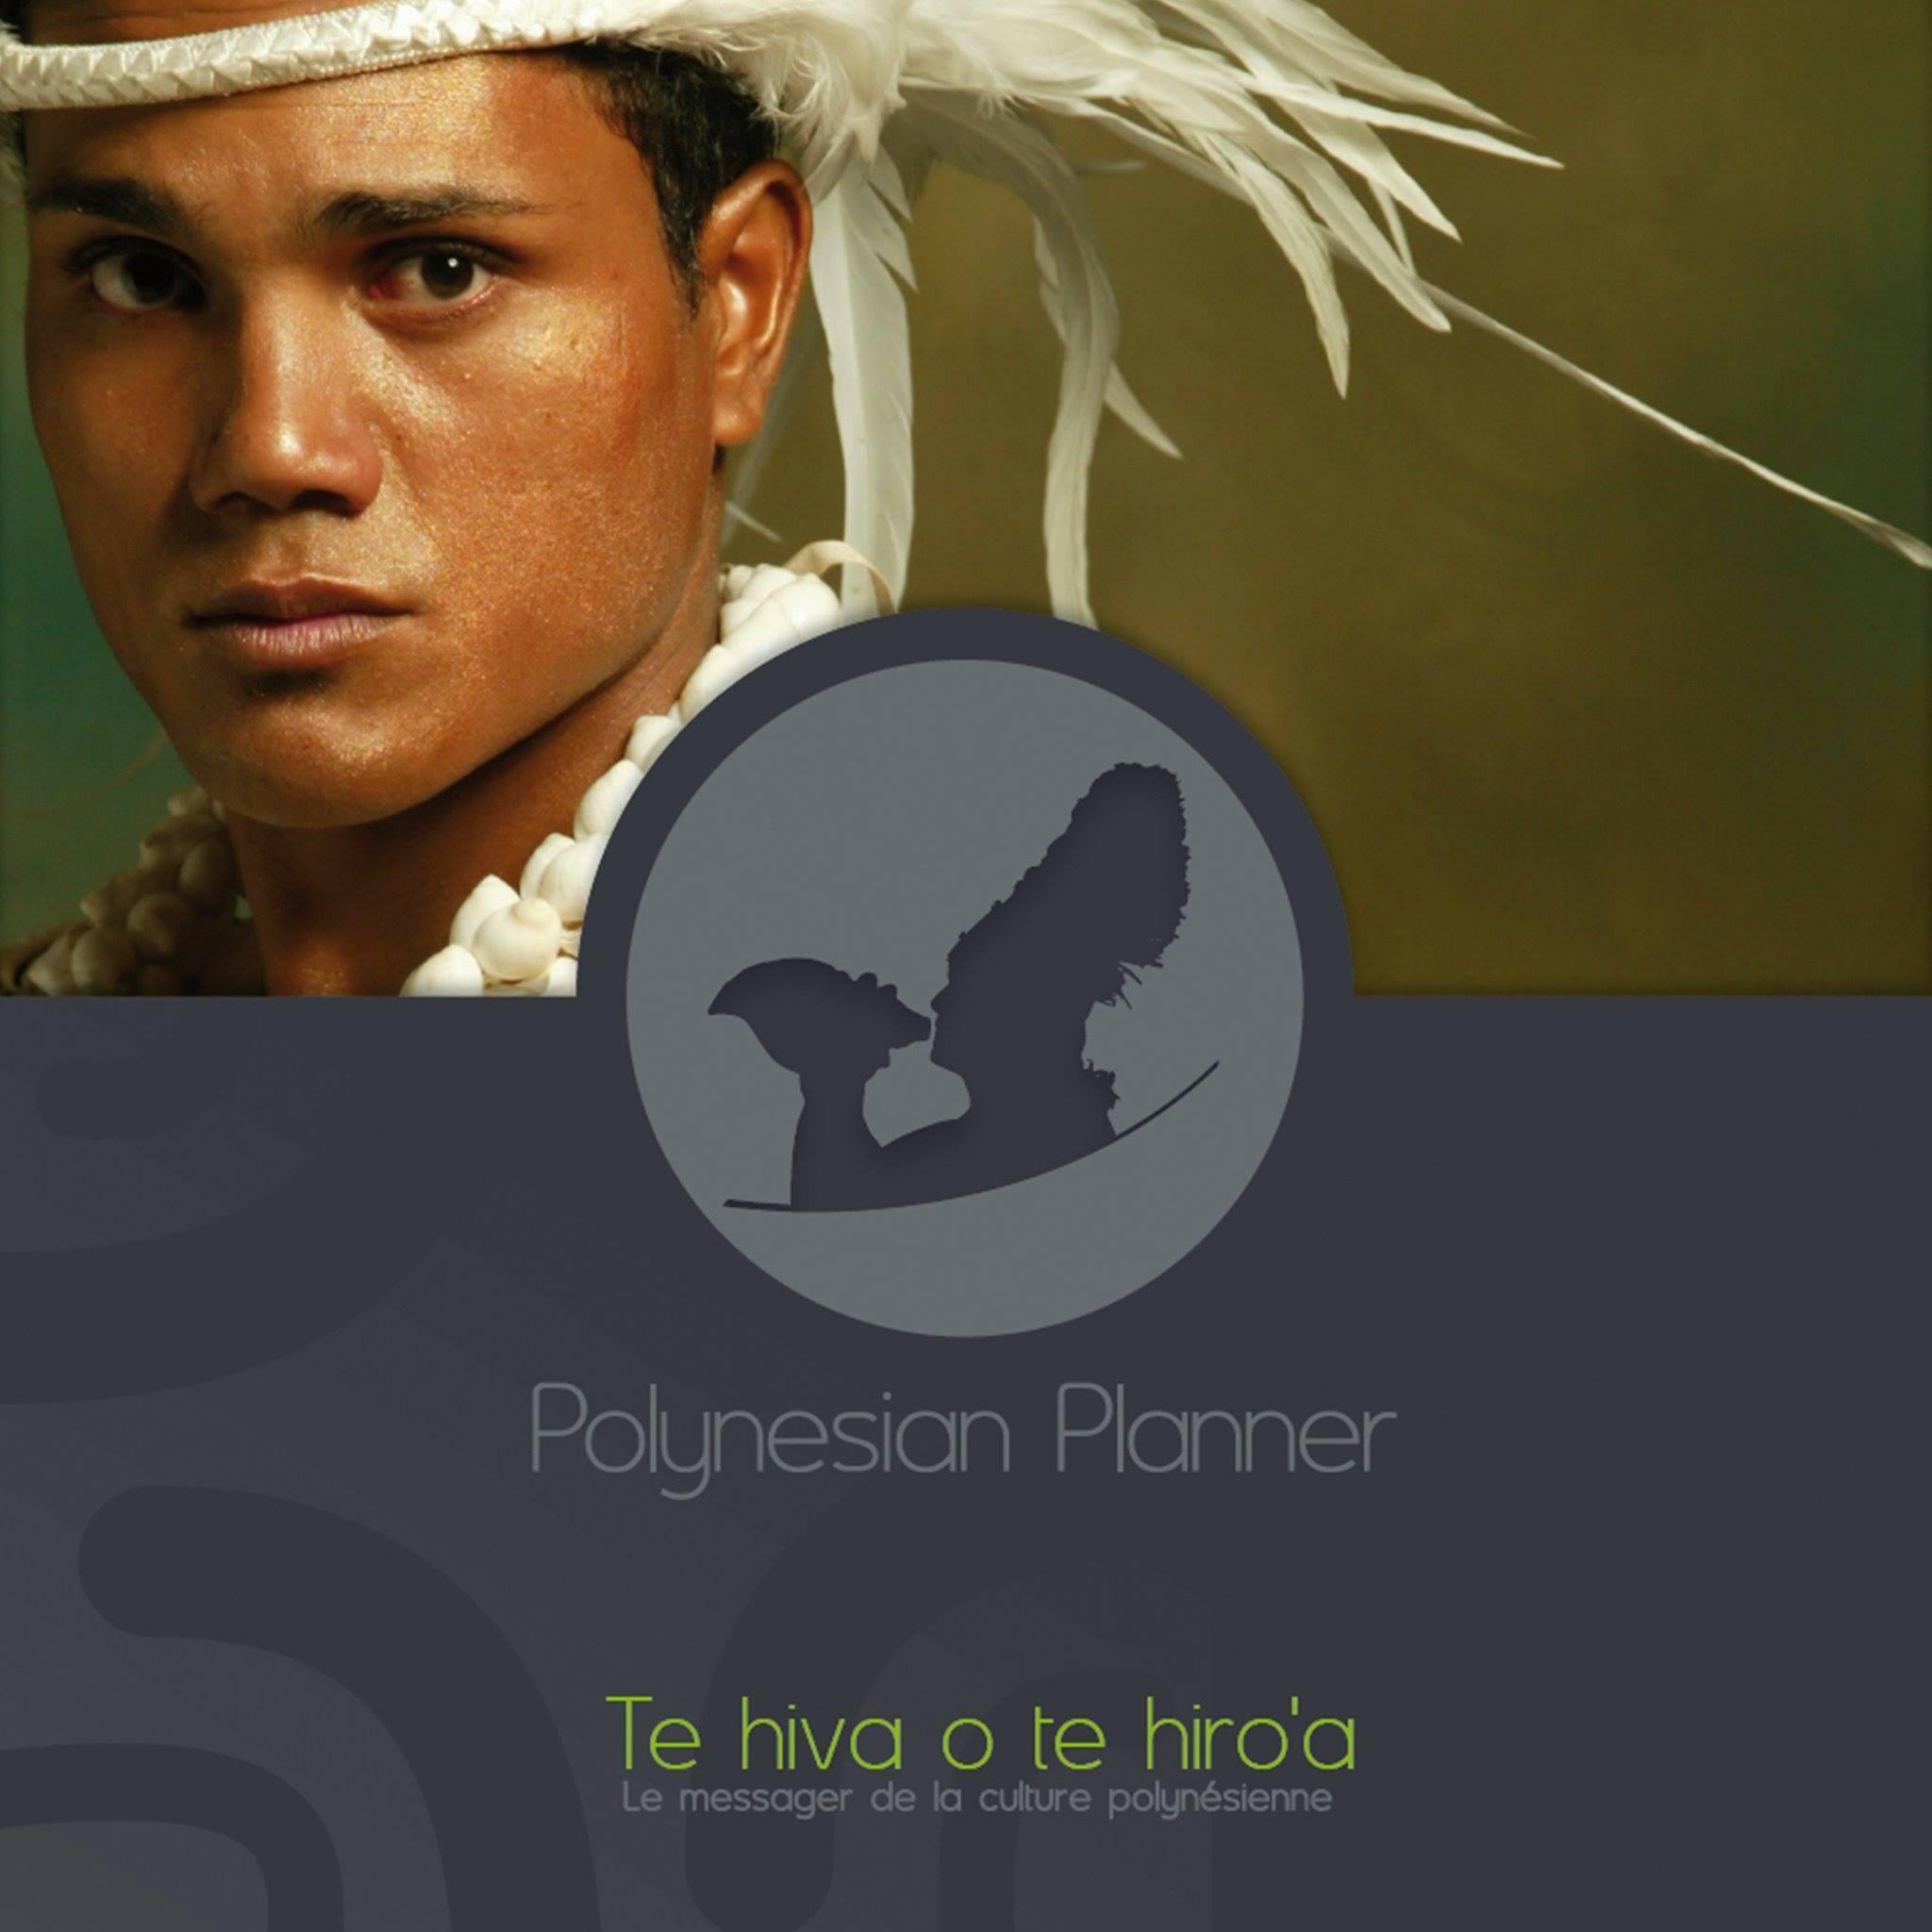 https://tahititourisme.ca/wp-content/uploads/2017/08/polynesianplannerphotodeprofil.jpg